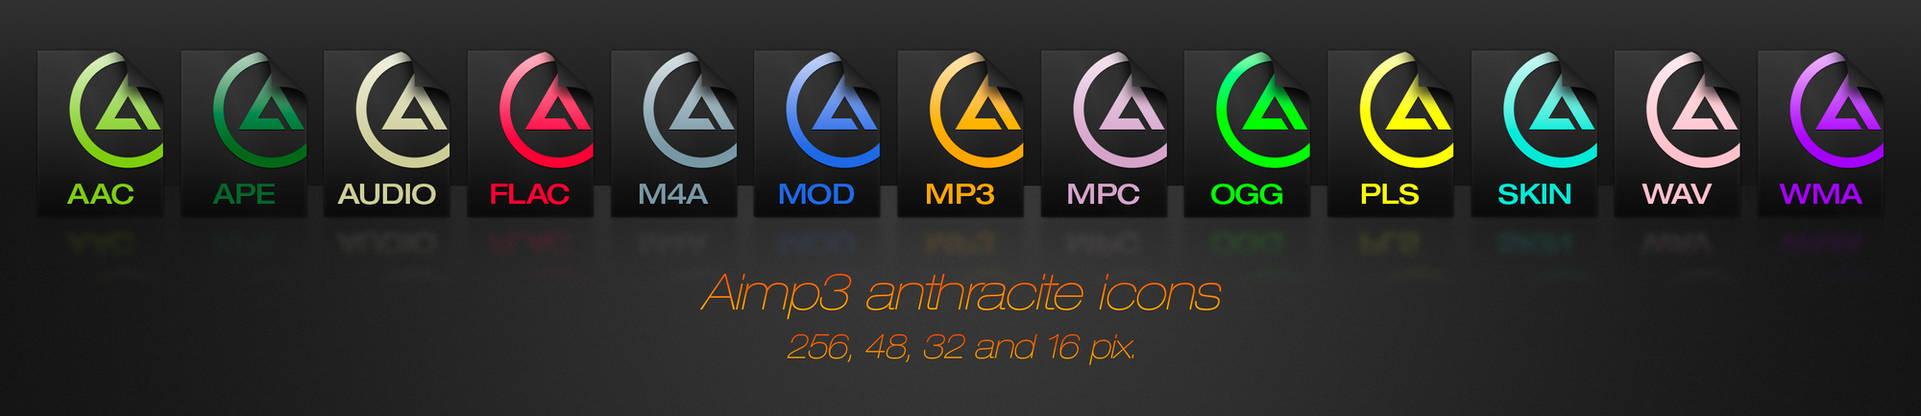 Aimp 3 anthracite icons